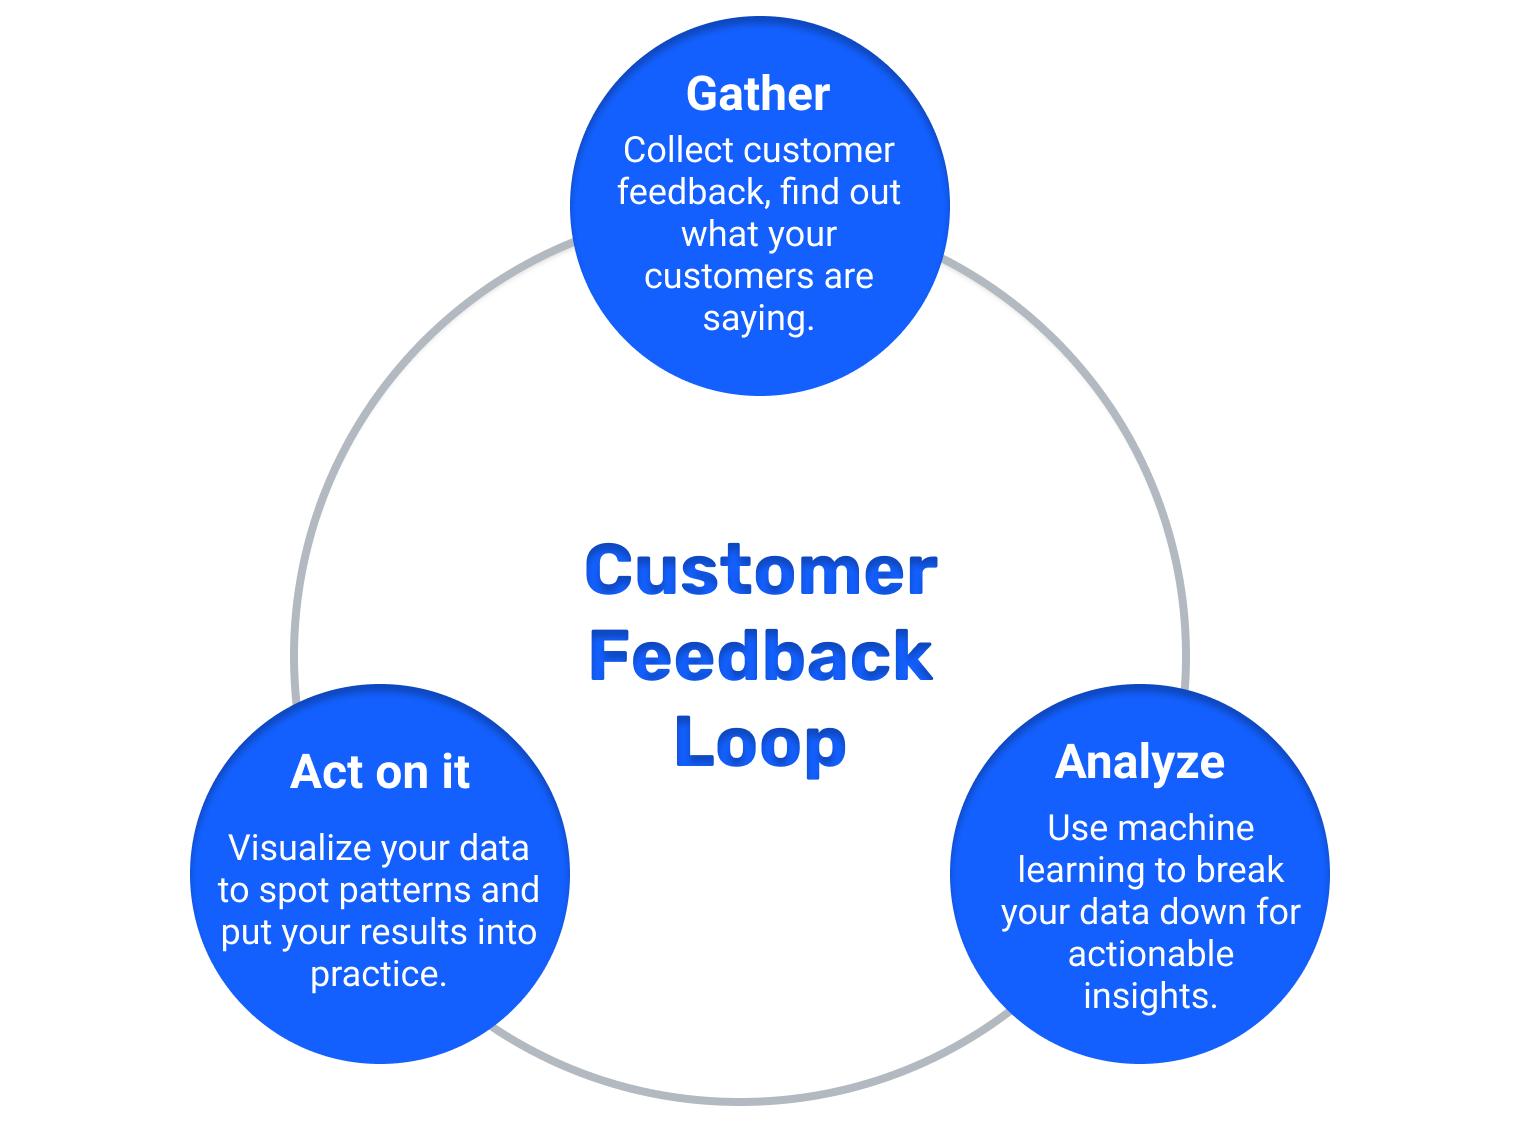 Three steps to close the customer feedback loop: 1.gather customer feedback, 2. Analyze customer feedback, 3. Act on customer feedback